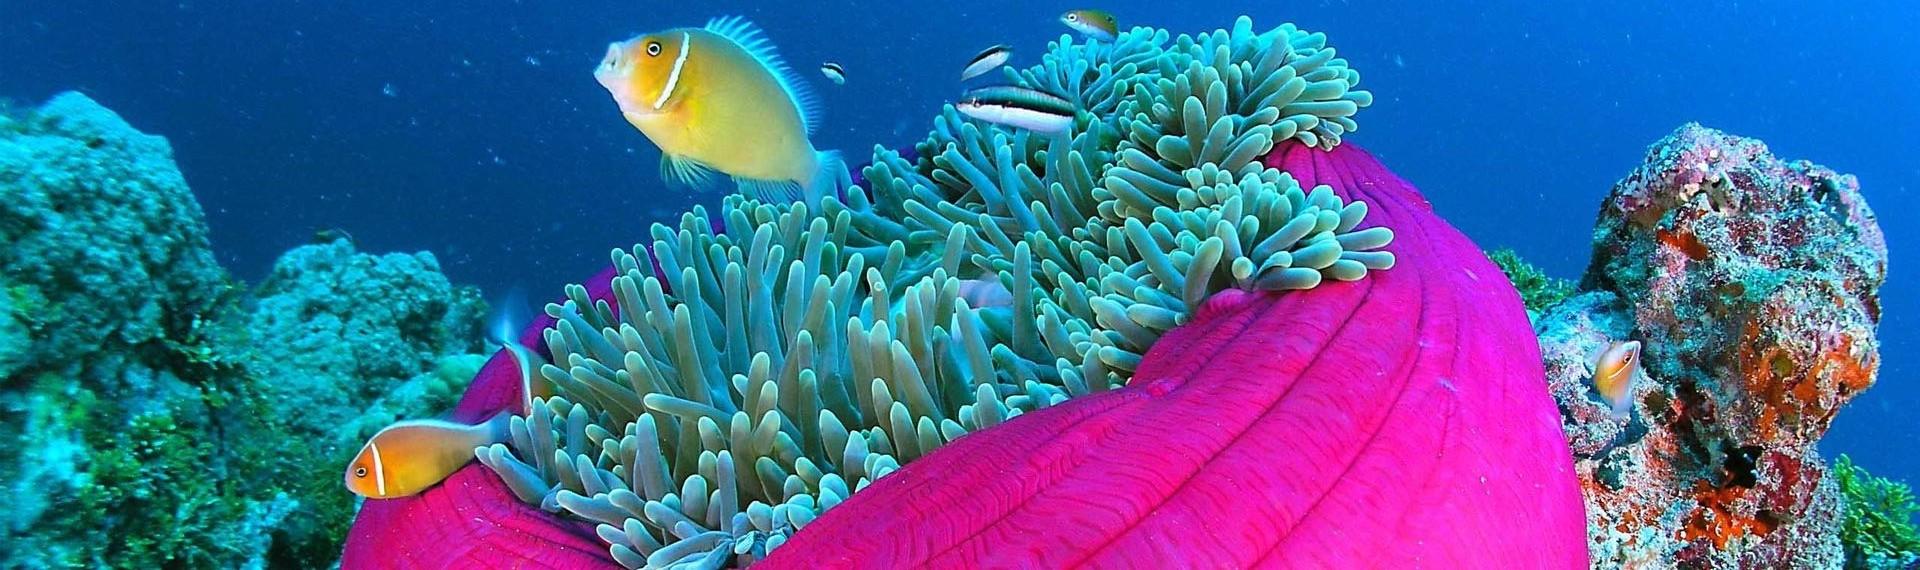 Reef Glory